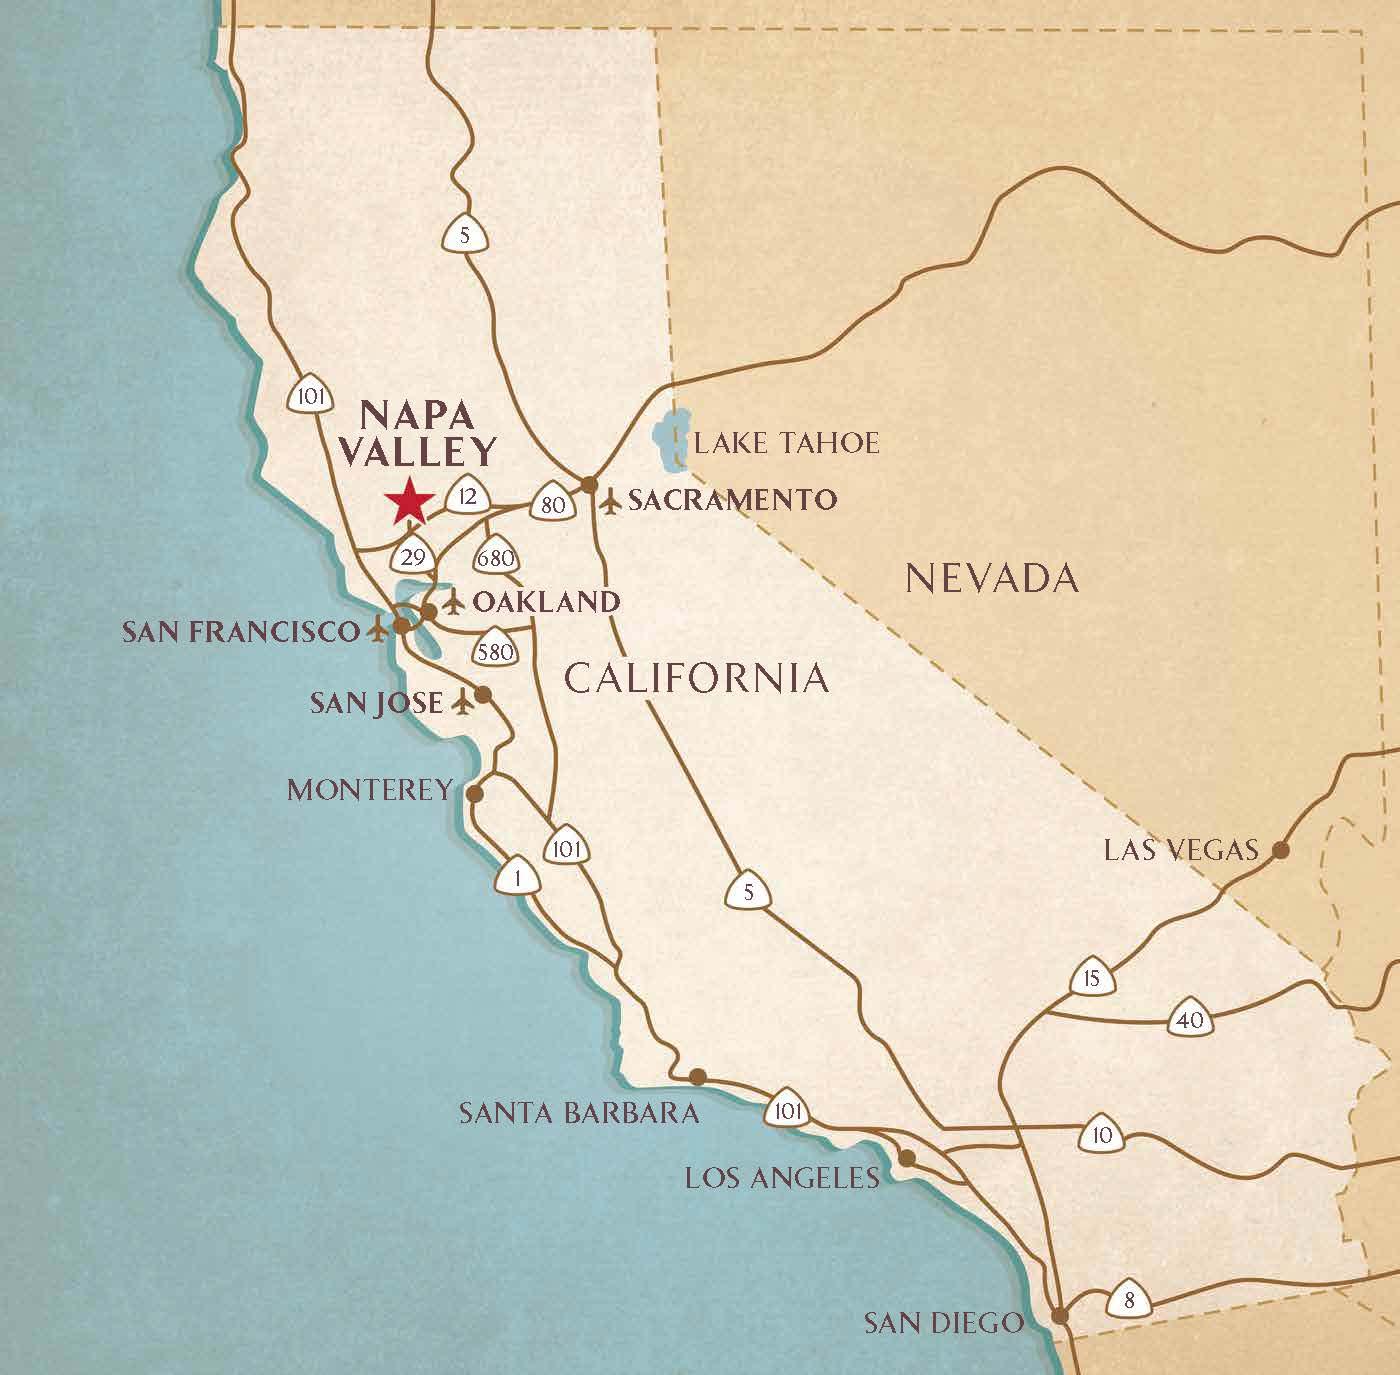 Napa Ca Map Getting to the Napa Valley | Airports, Transportation Services  Napa Ca Map